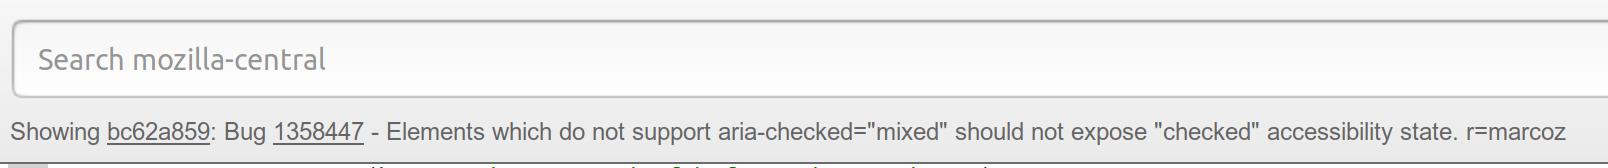 Searchfox changeset header